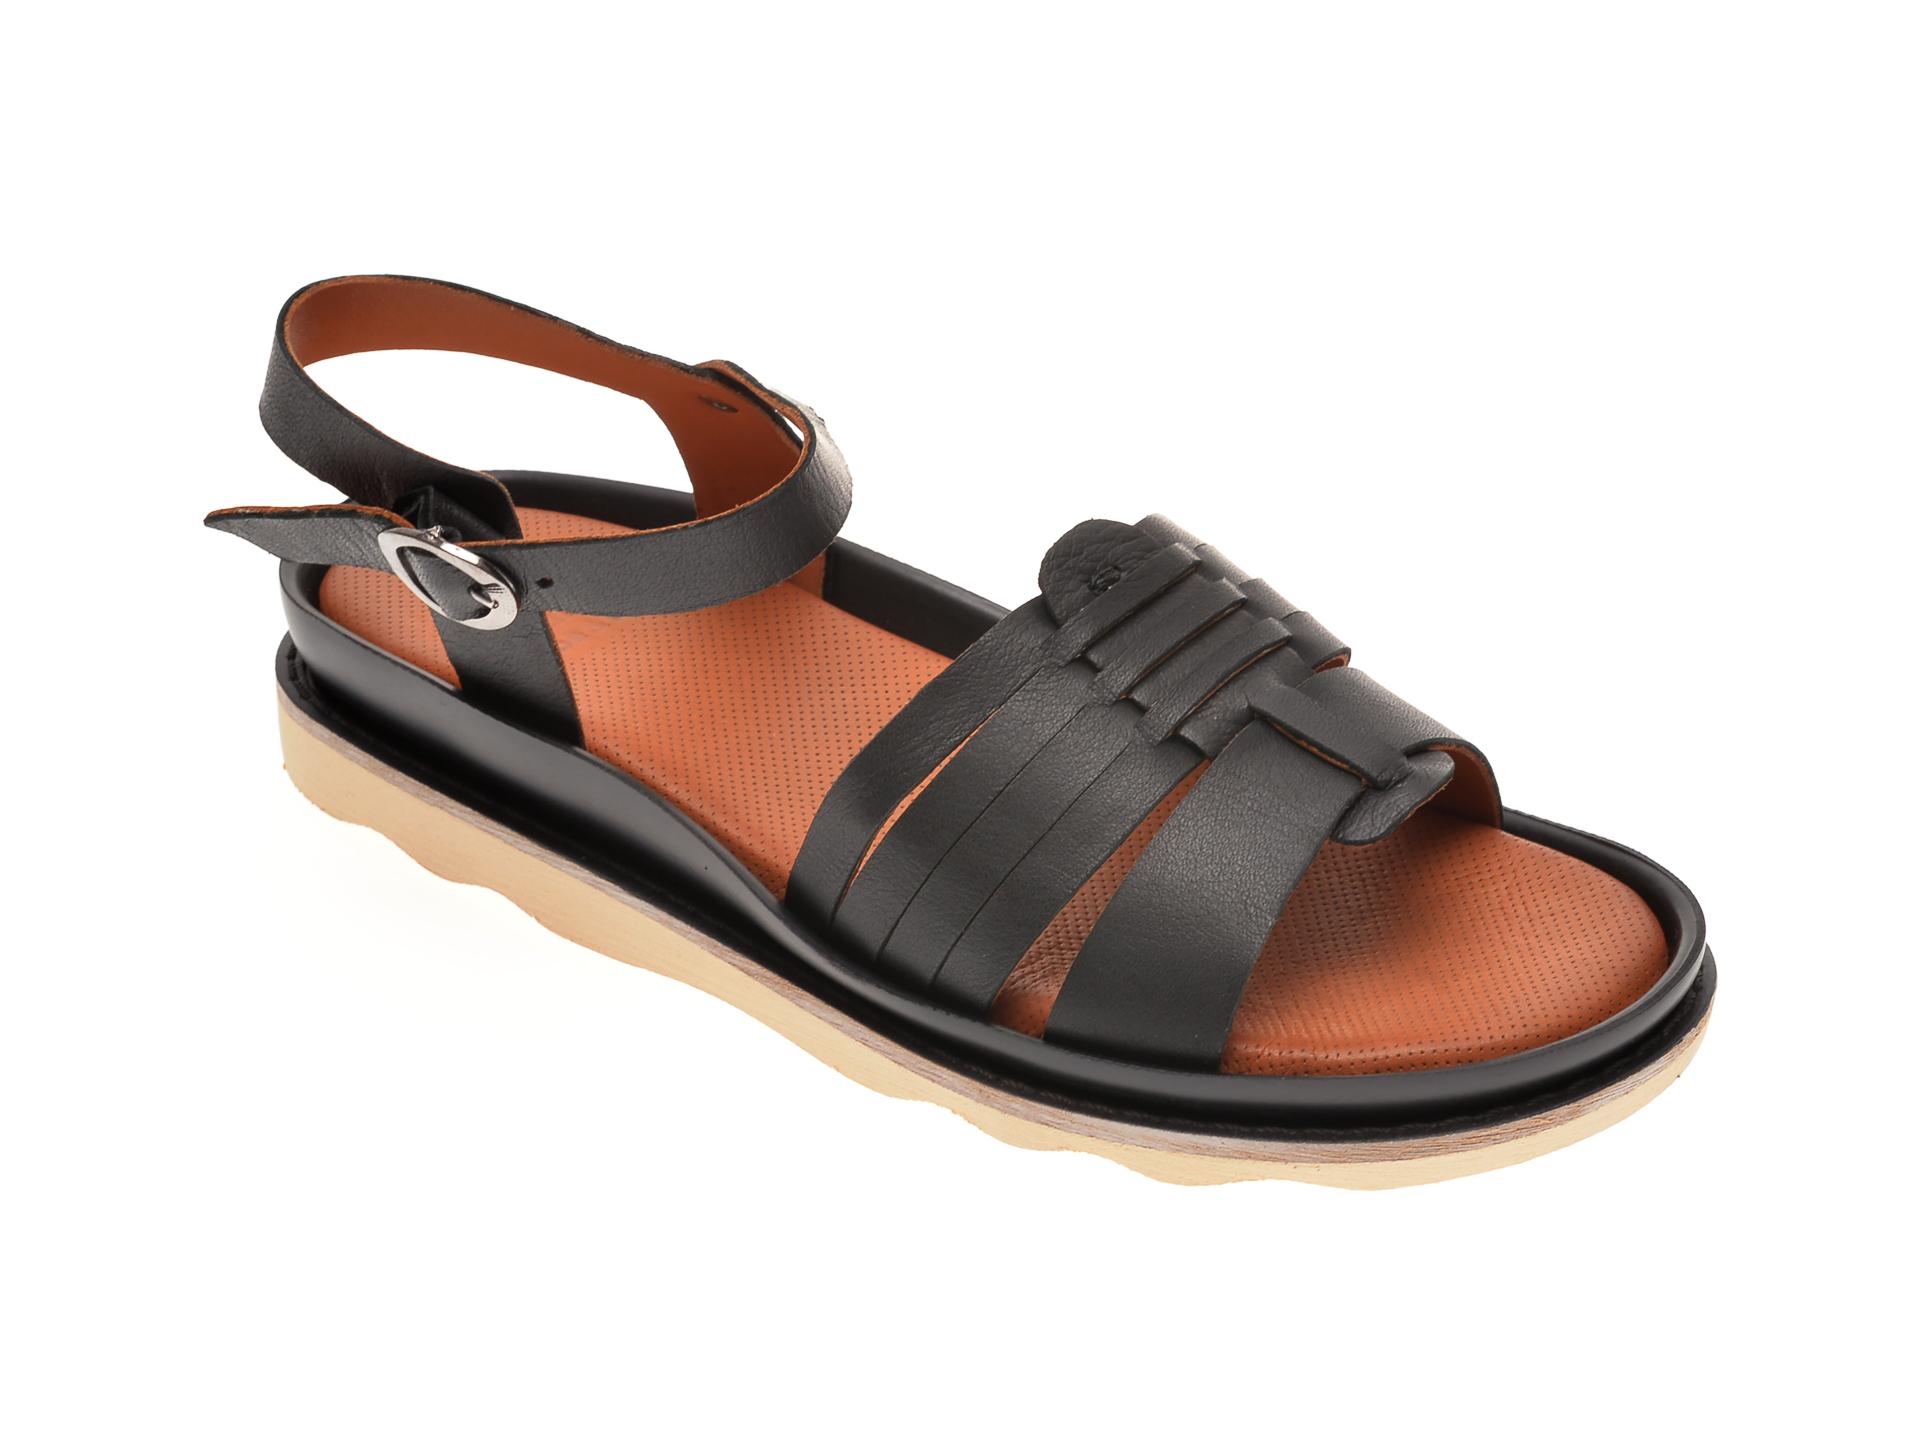 Sandale BABOOS negre, 0404, din piele naturala imagine